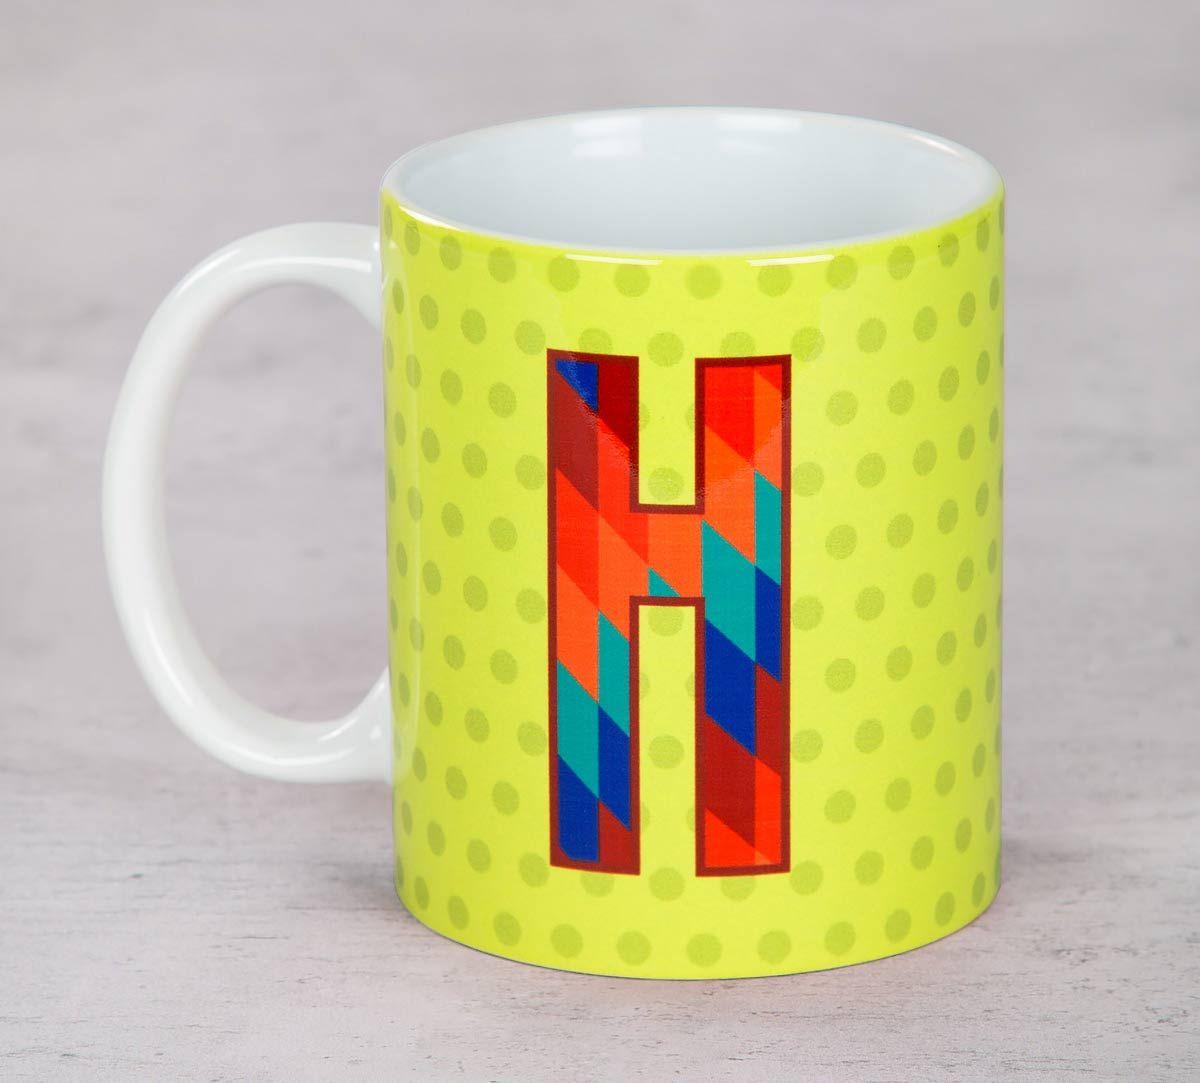 Dotted Halcyon Coffee Mug